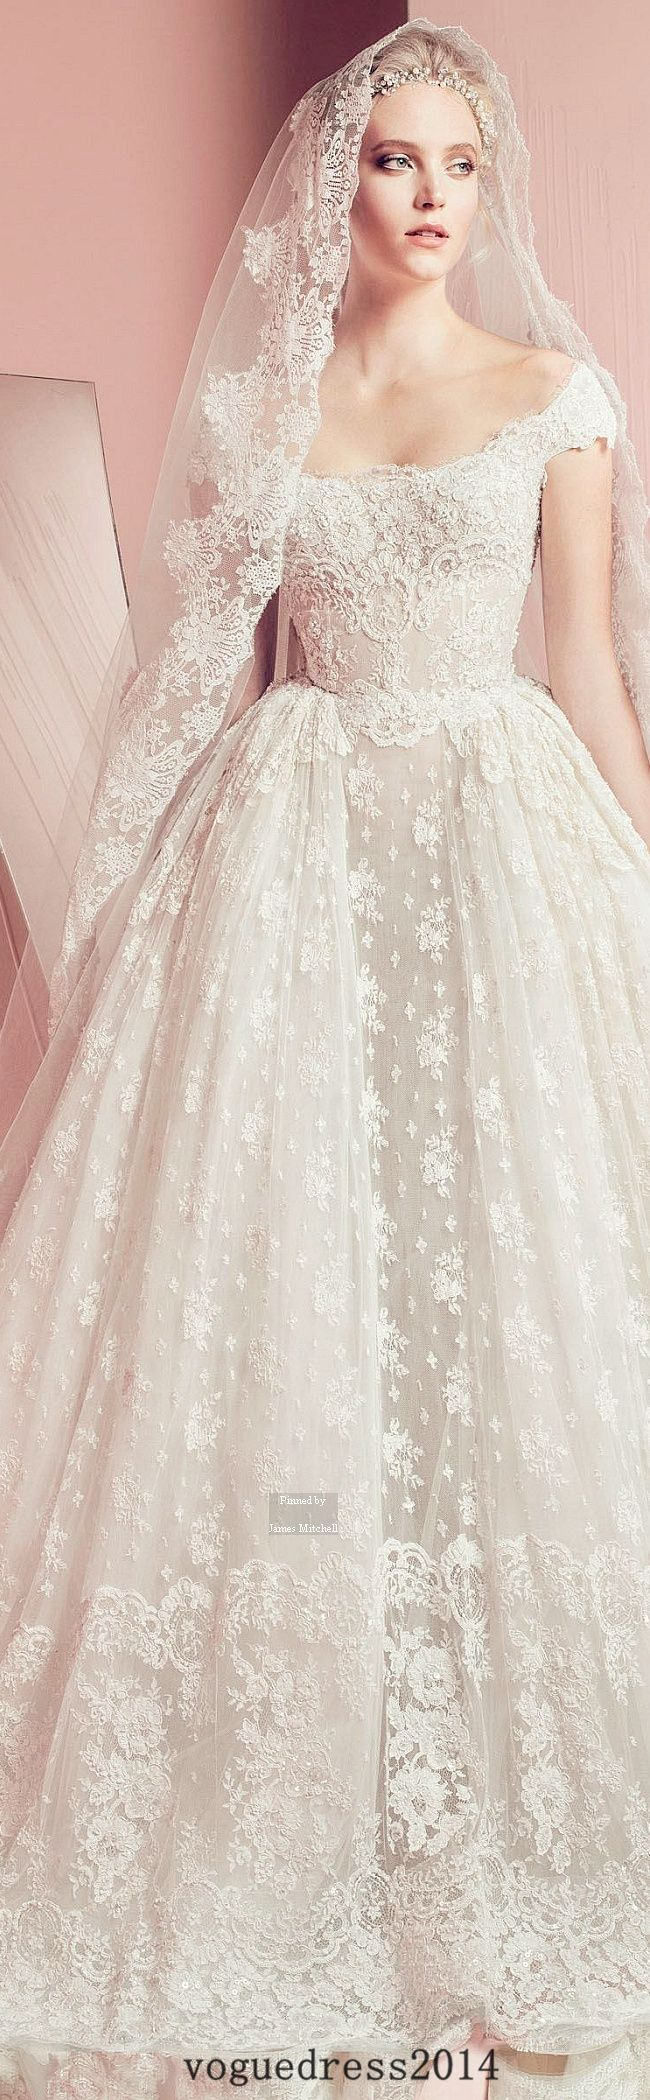 best wedding dress images on pinterest